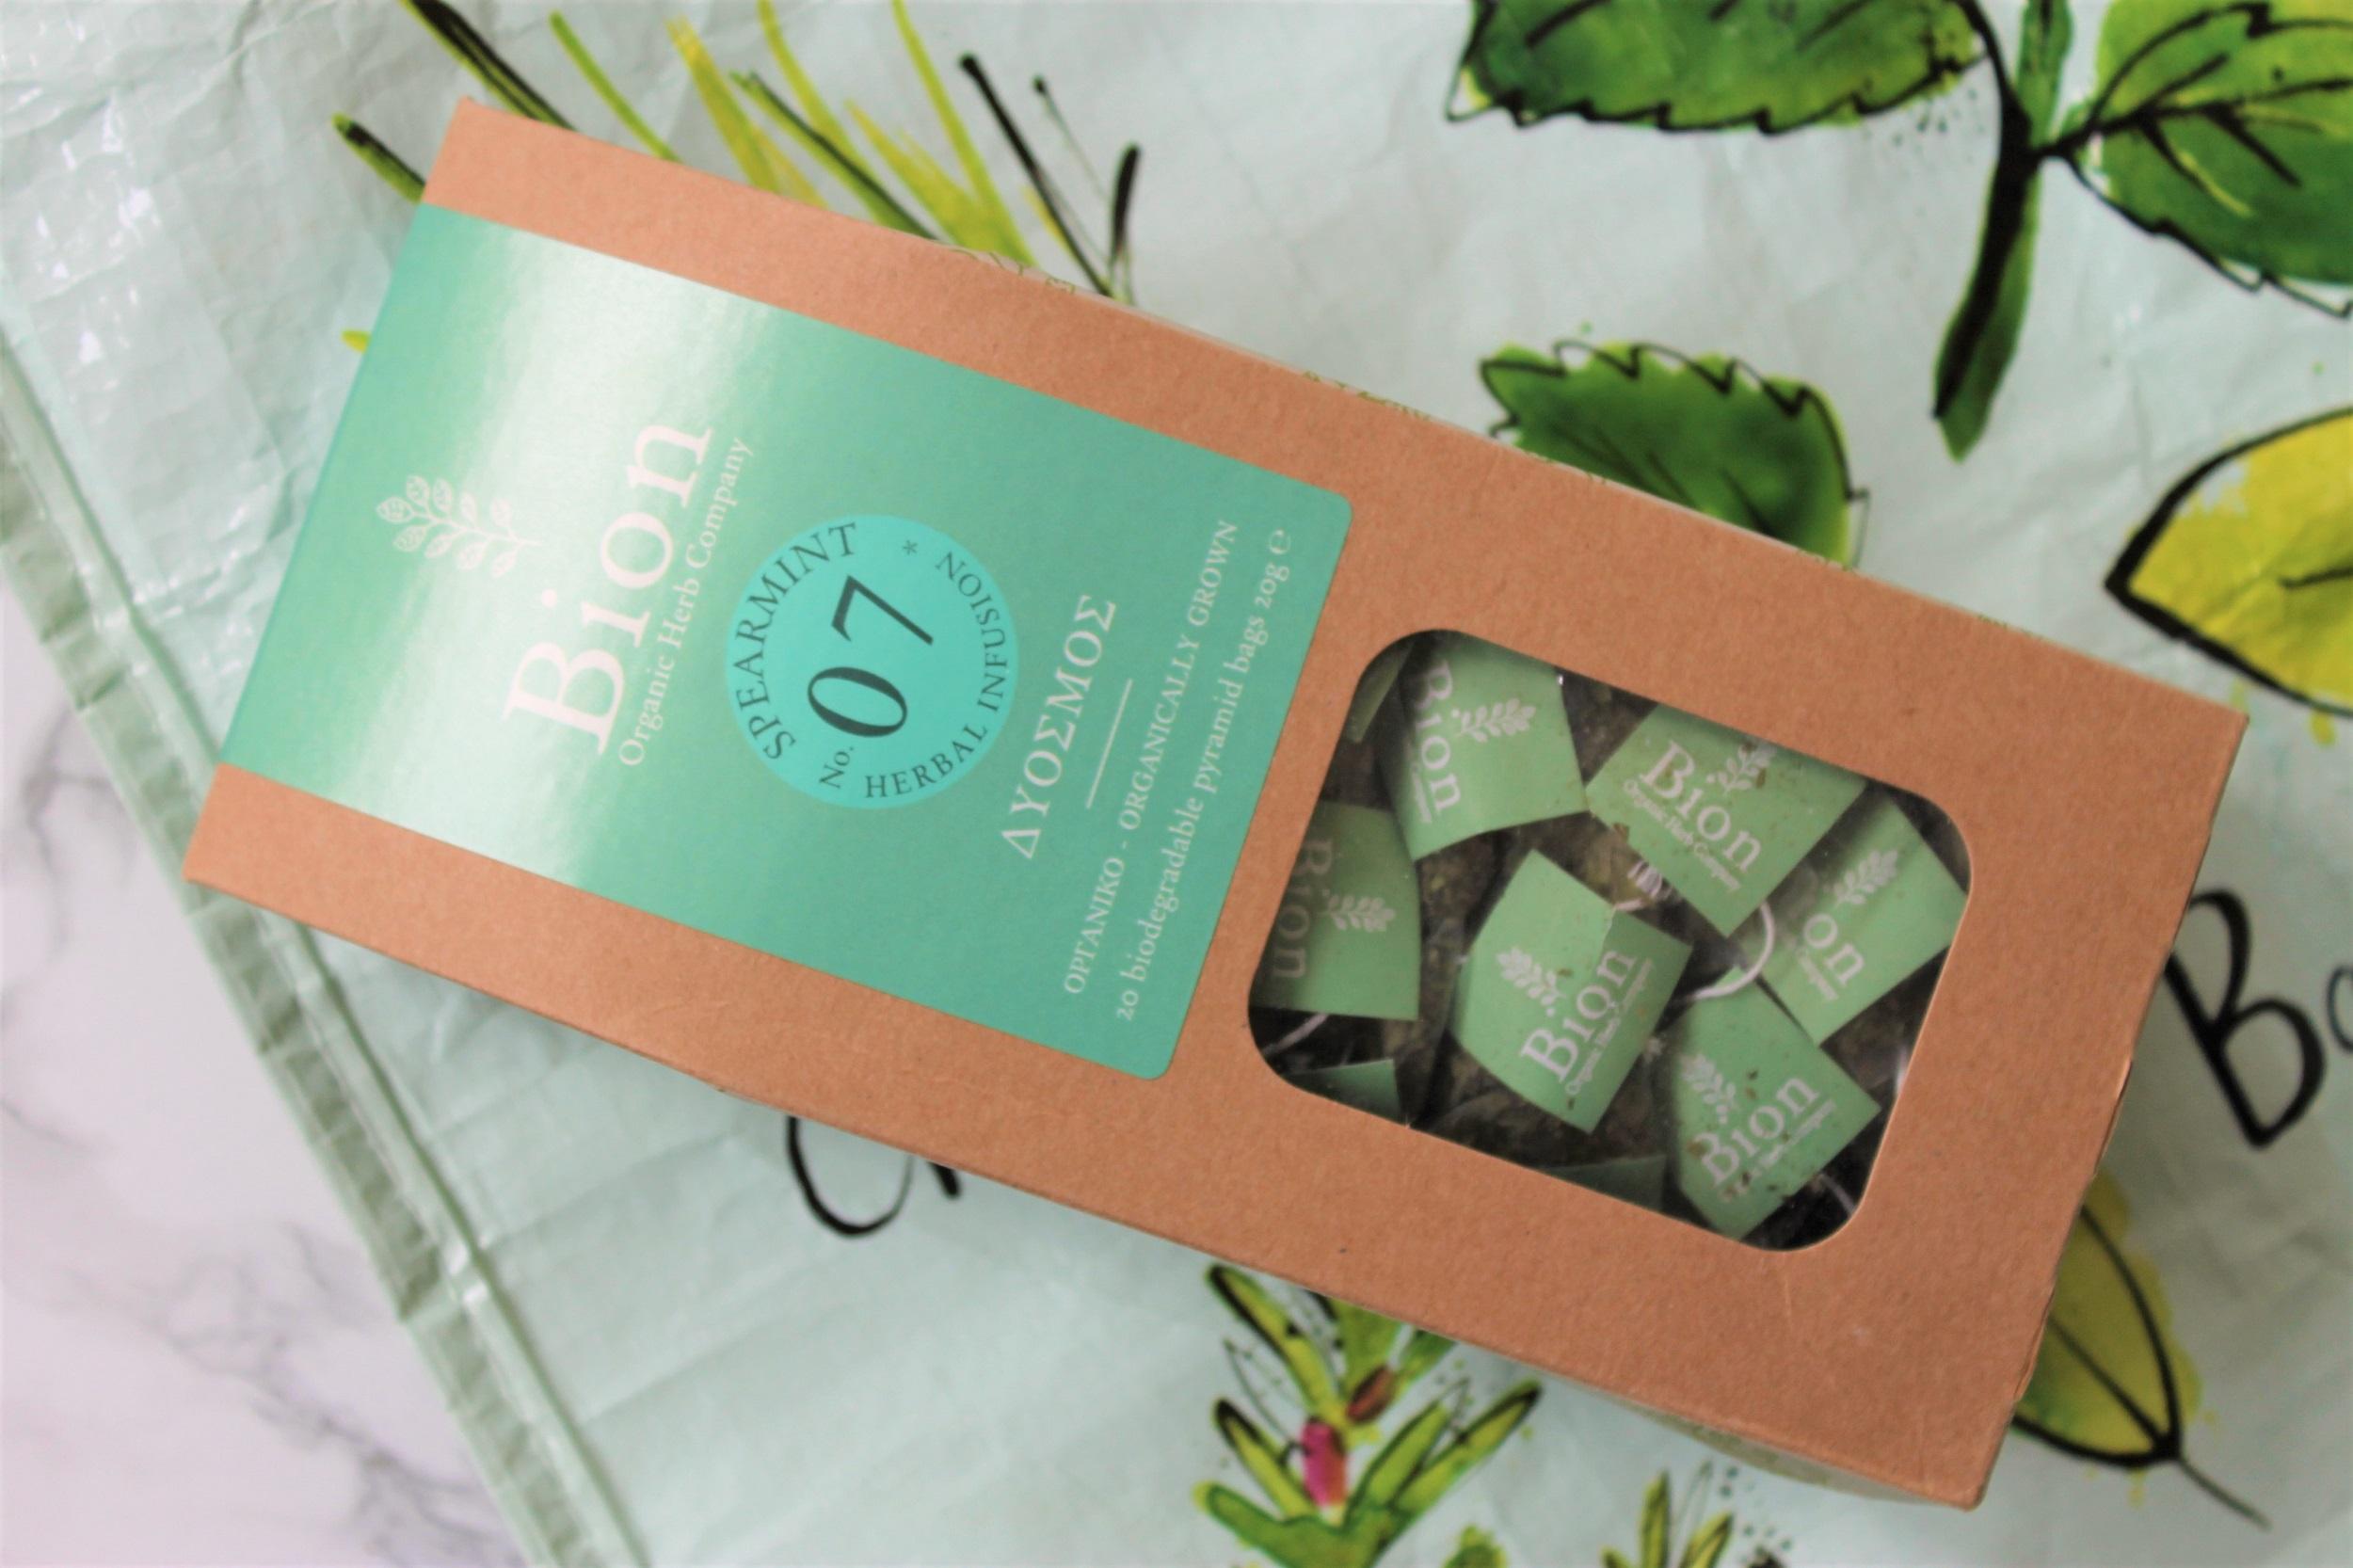 bion spearmint tea pyramids in box